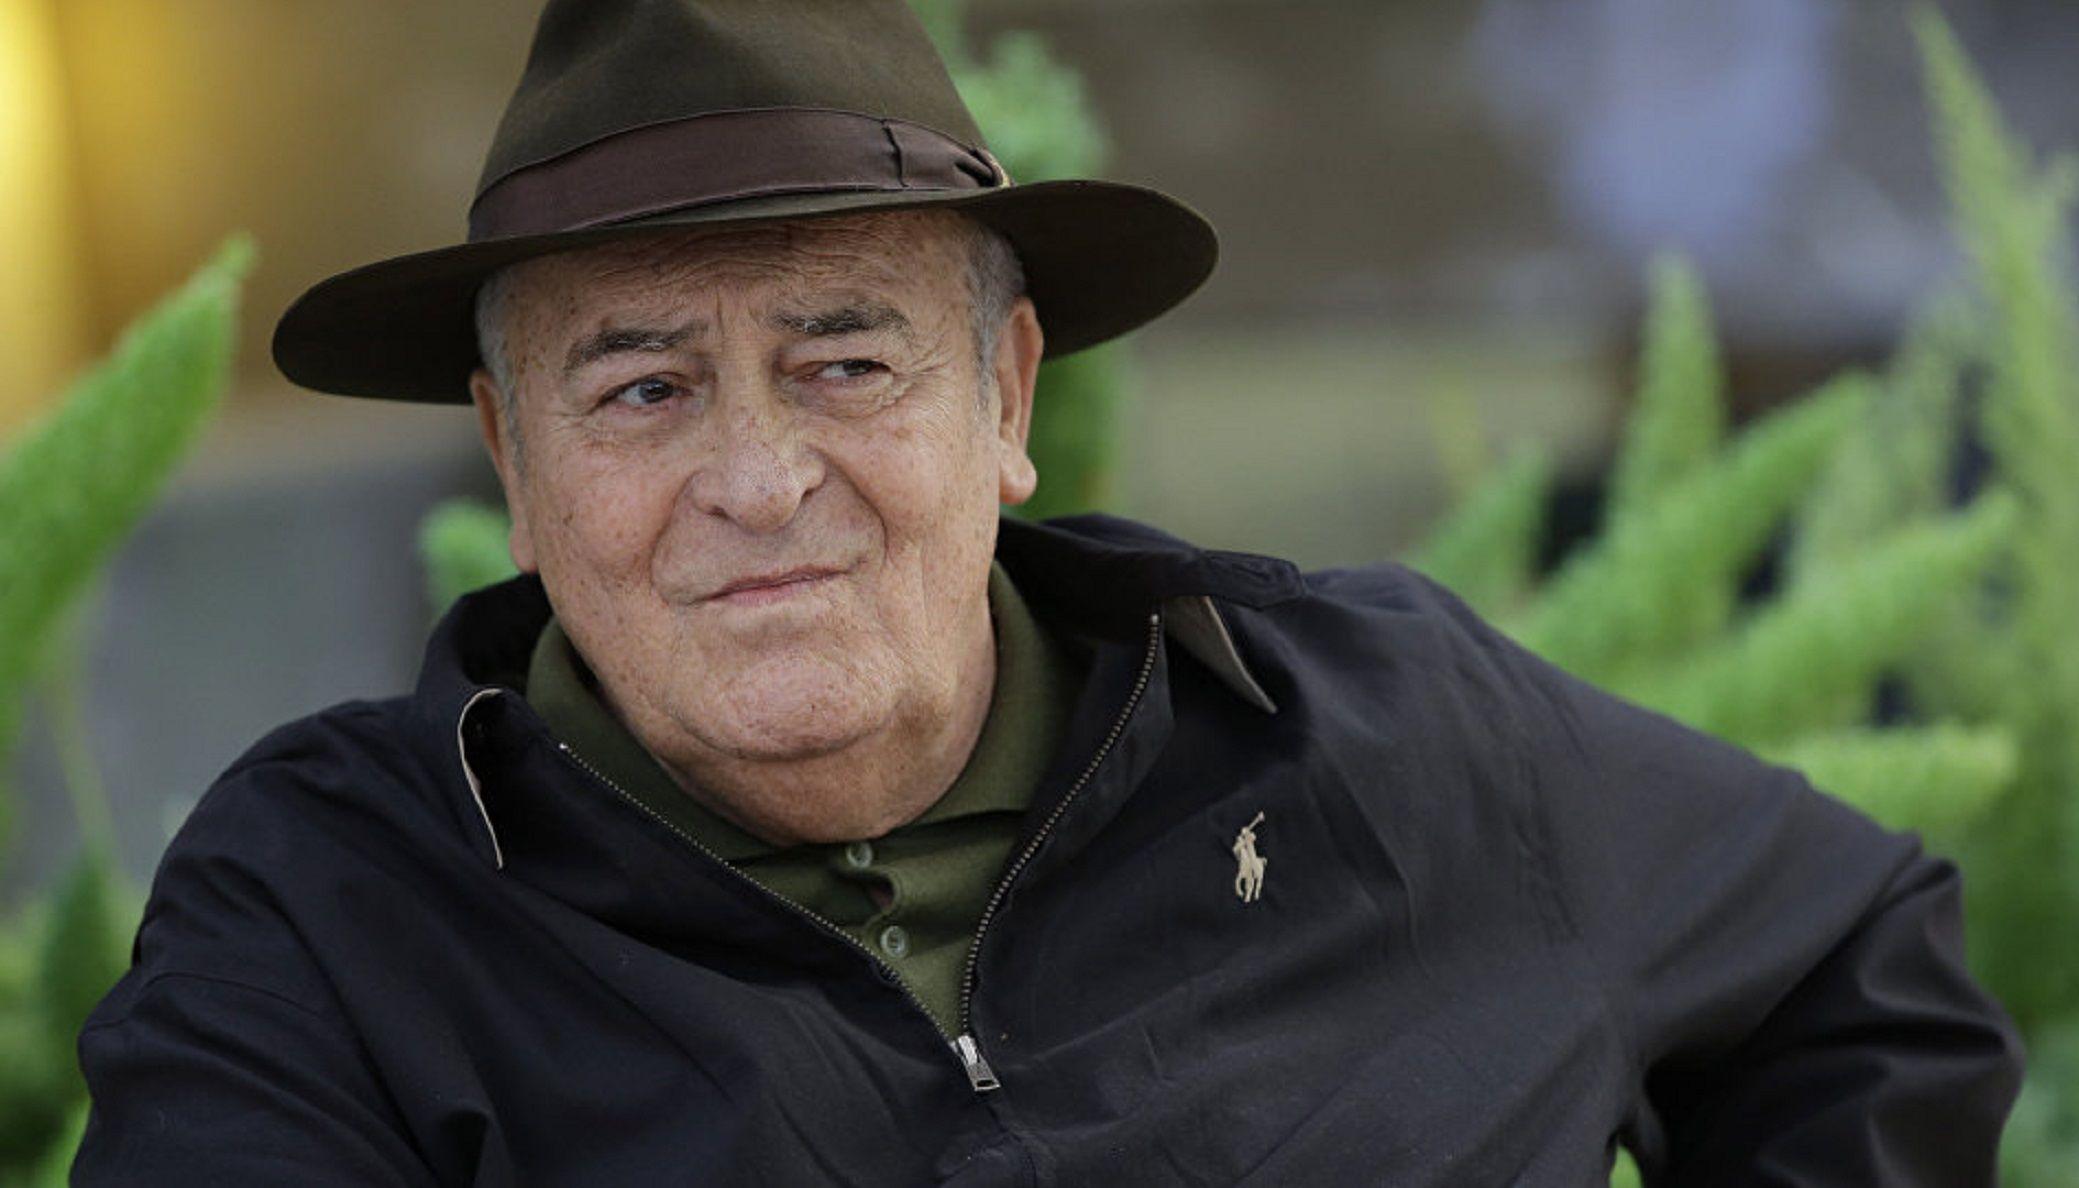 Murió el cineasta italiano Bernardo Bertolucci